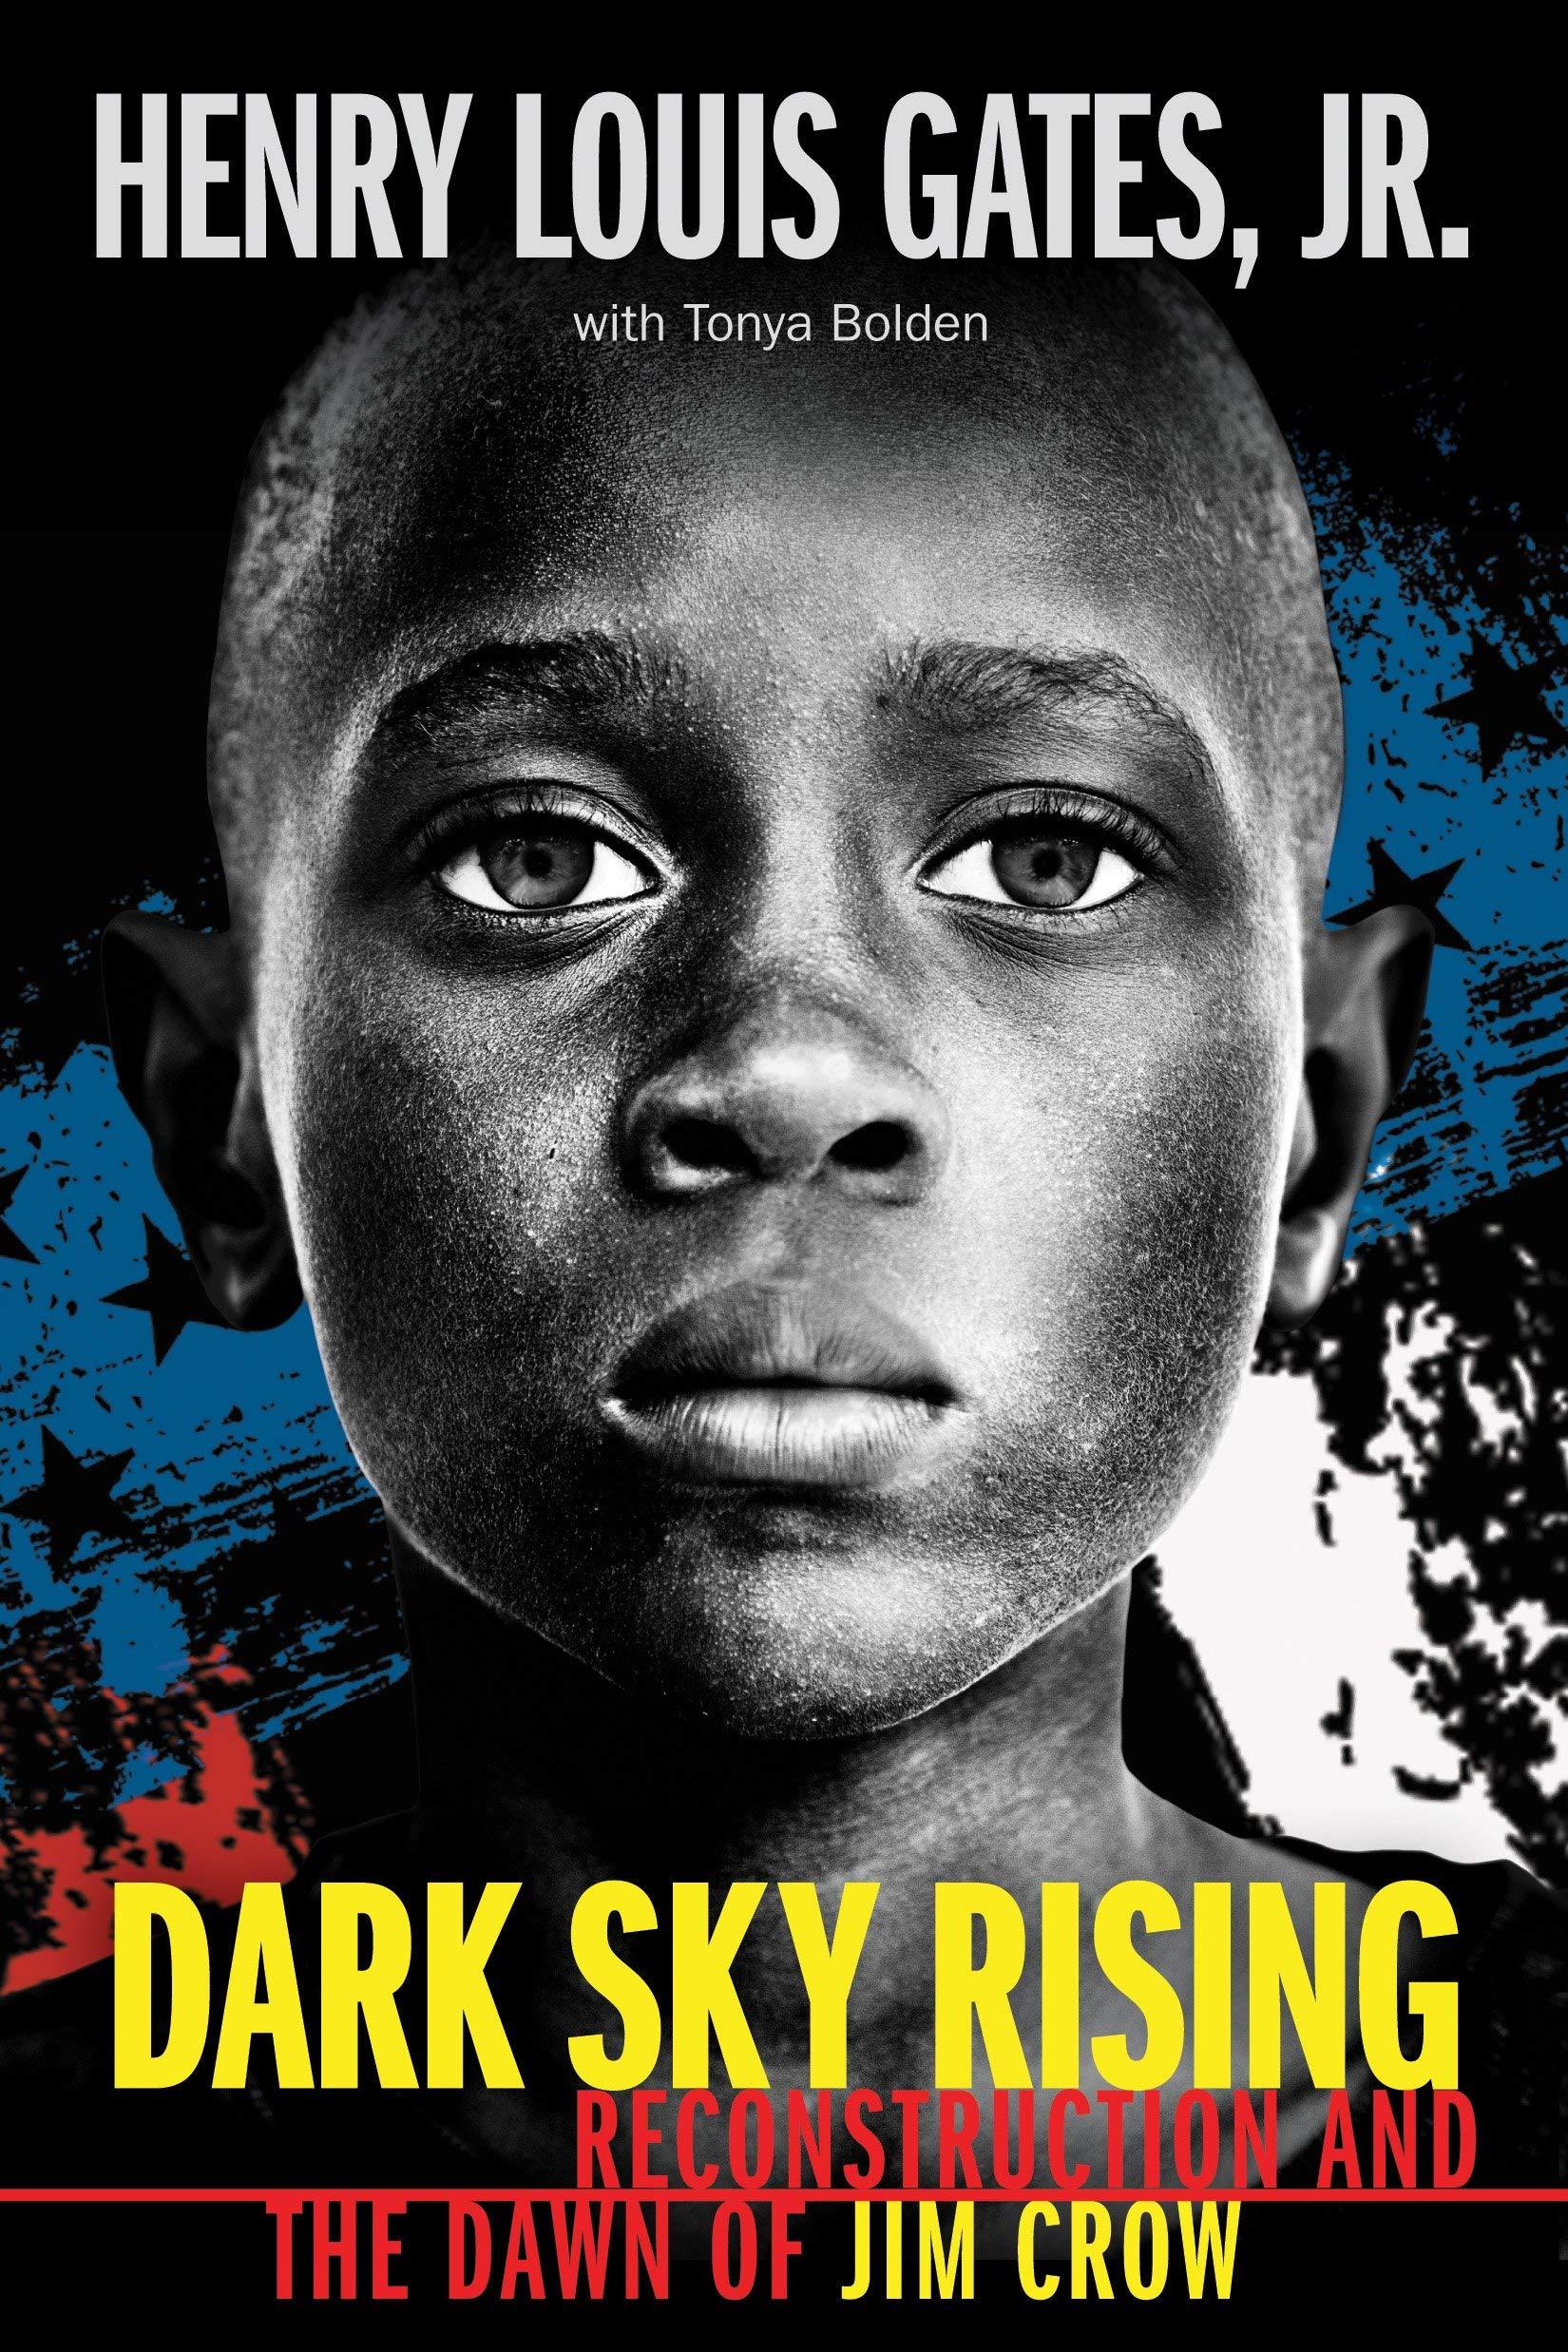 Amazon.com: Dark Sky Rising: Reconstruction and the Dawn of Jim ...